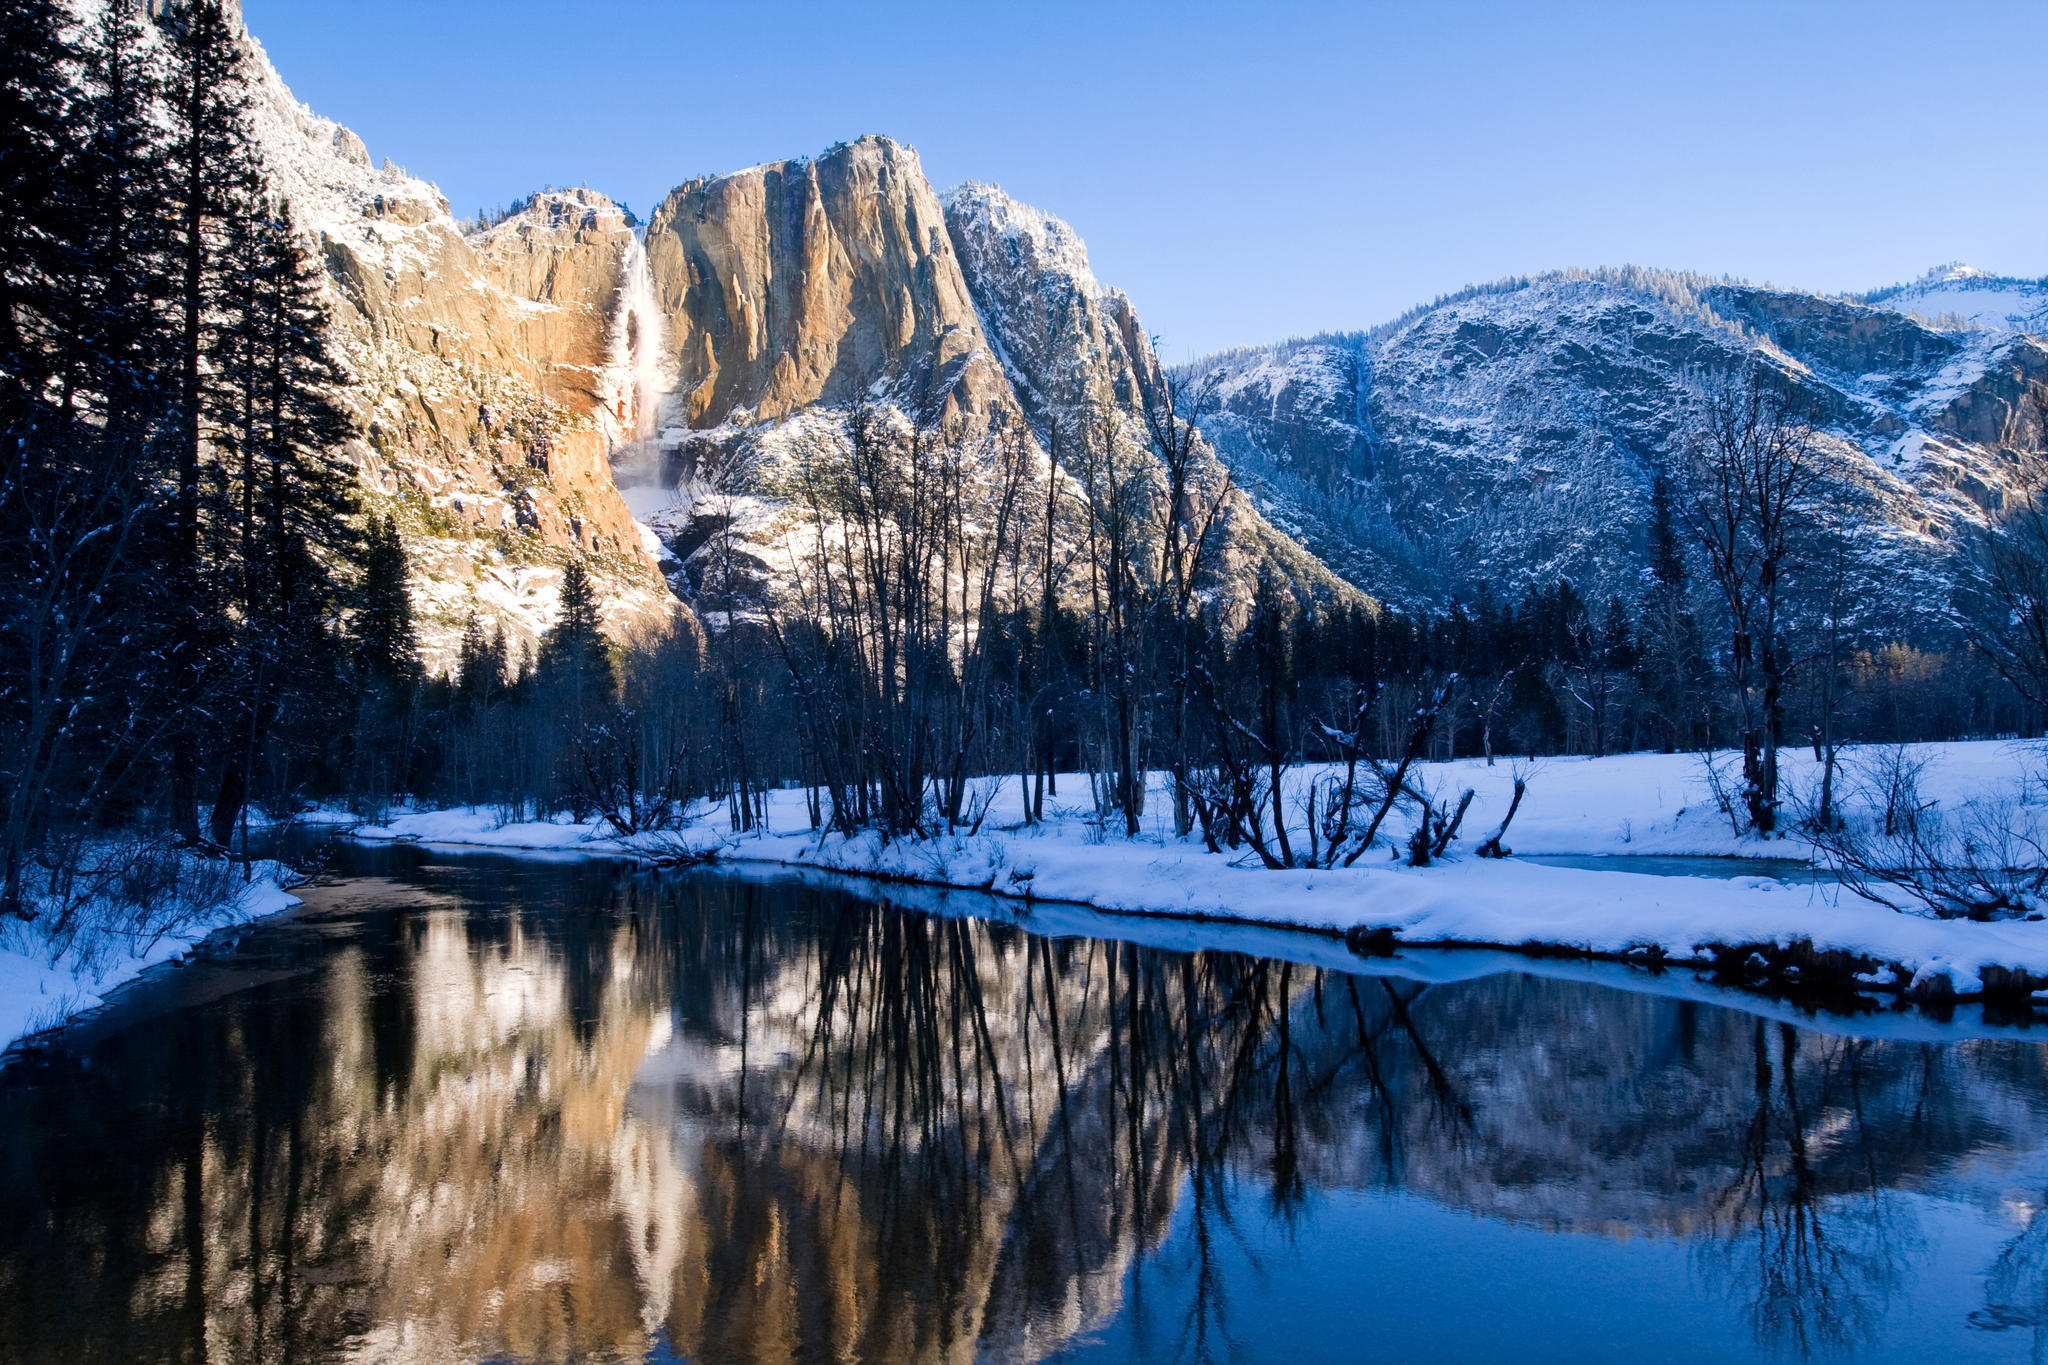 природа скалы деревья горы снег зима nature rock trees mountains snow winter  № 455836 бесплатно